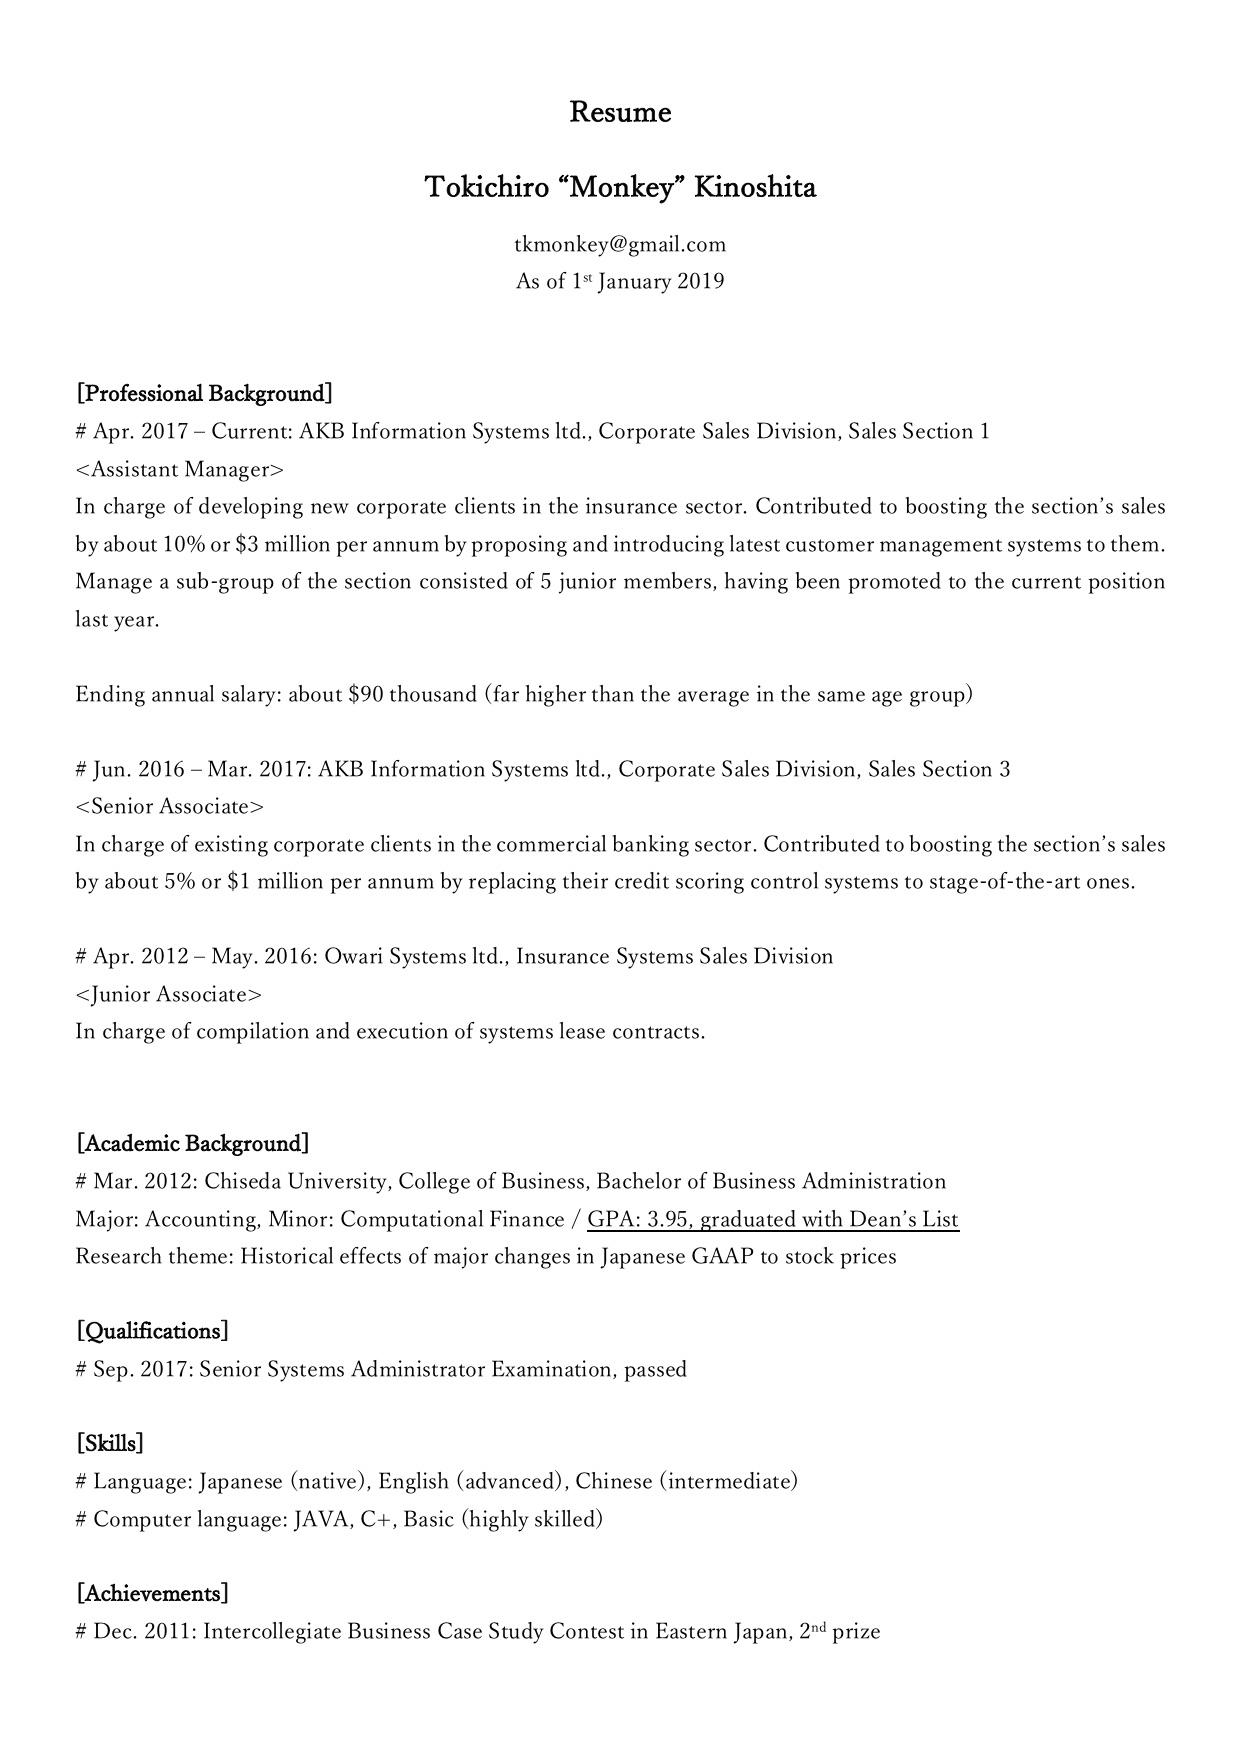 resume-english